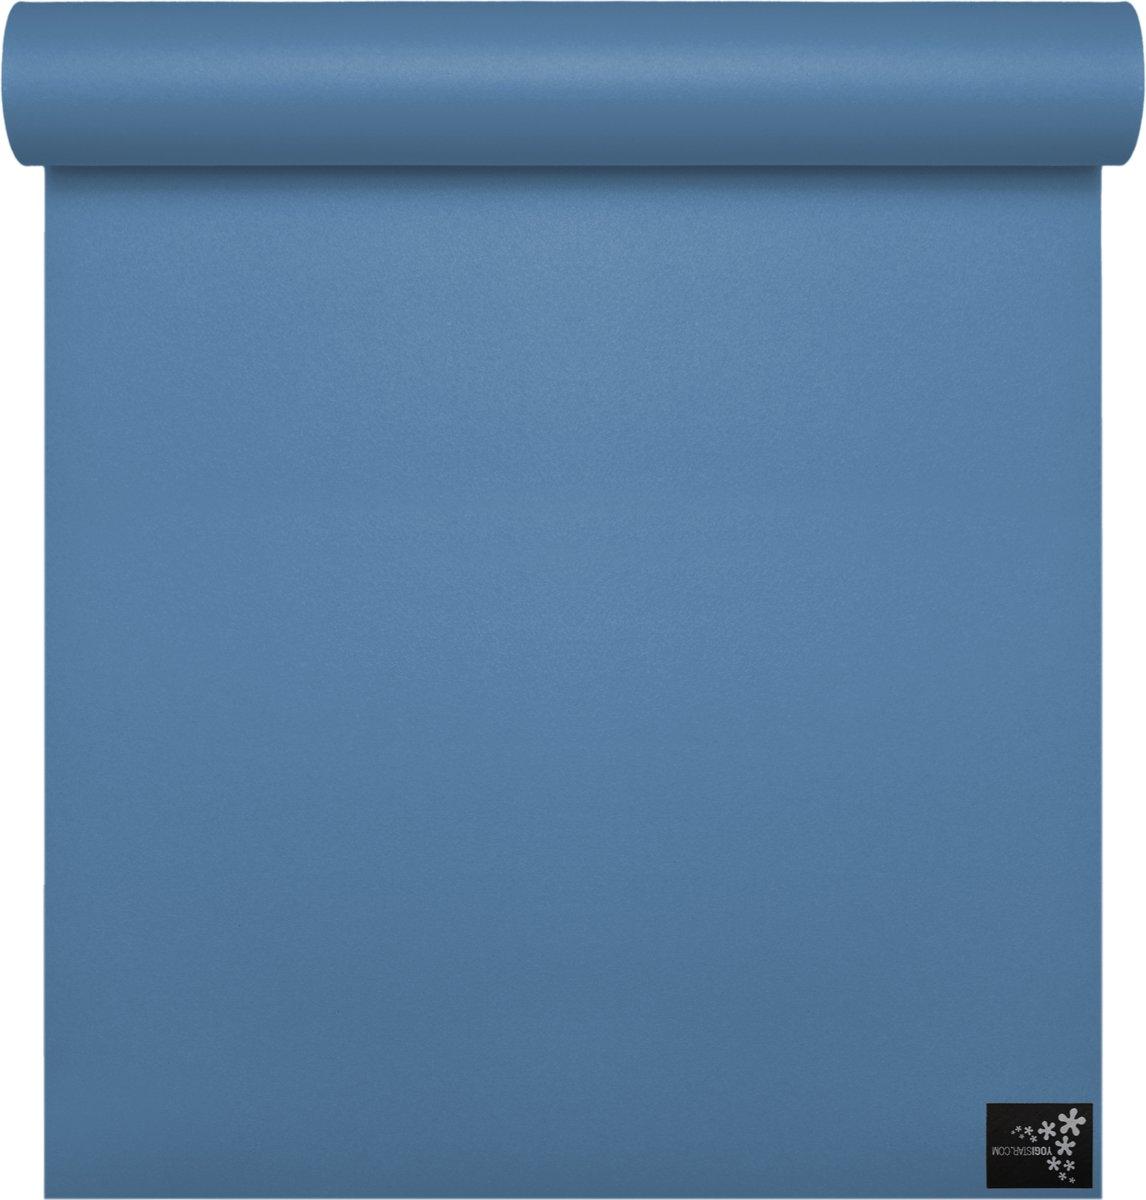 Yogamat sun - 4 mm topaz blue Fitnessmat YOGISTAR